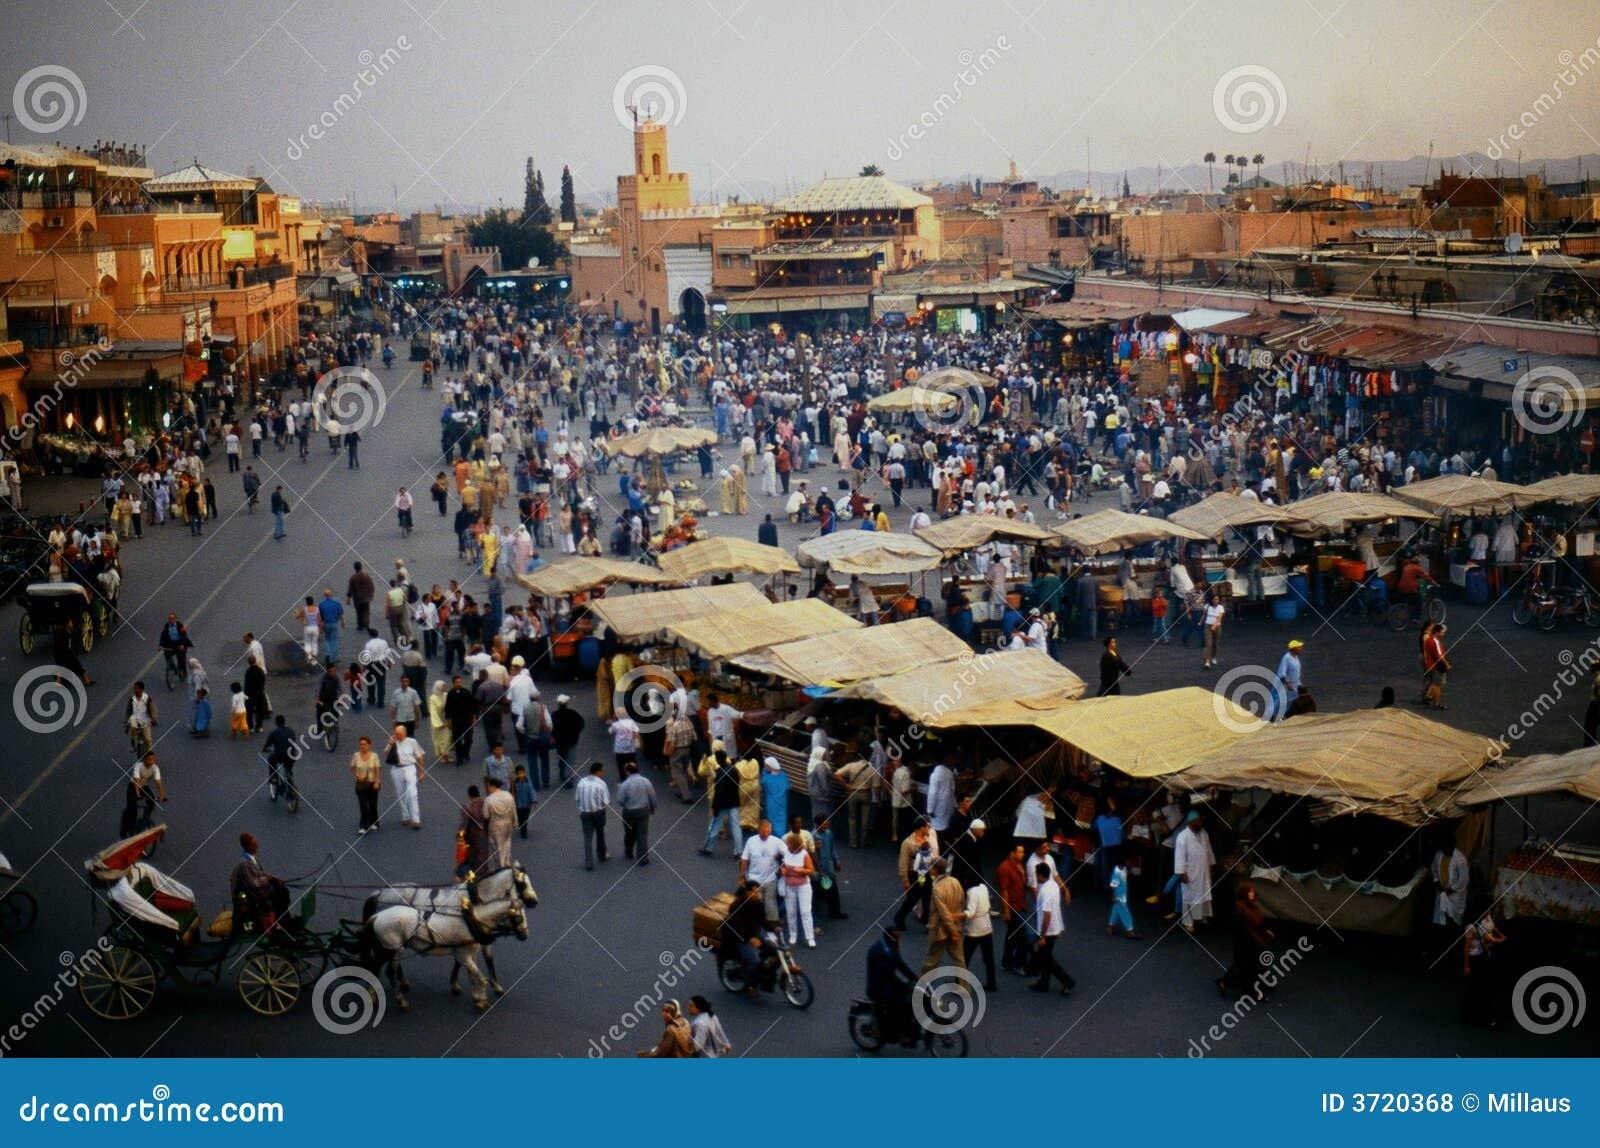 Piazza Djem EL fnaa in Marrakesch